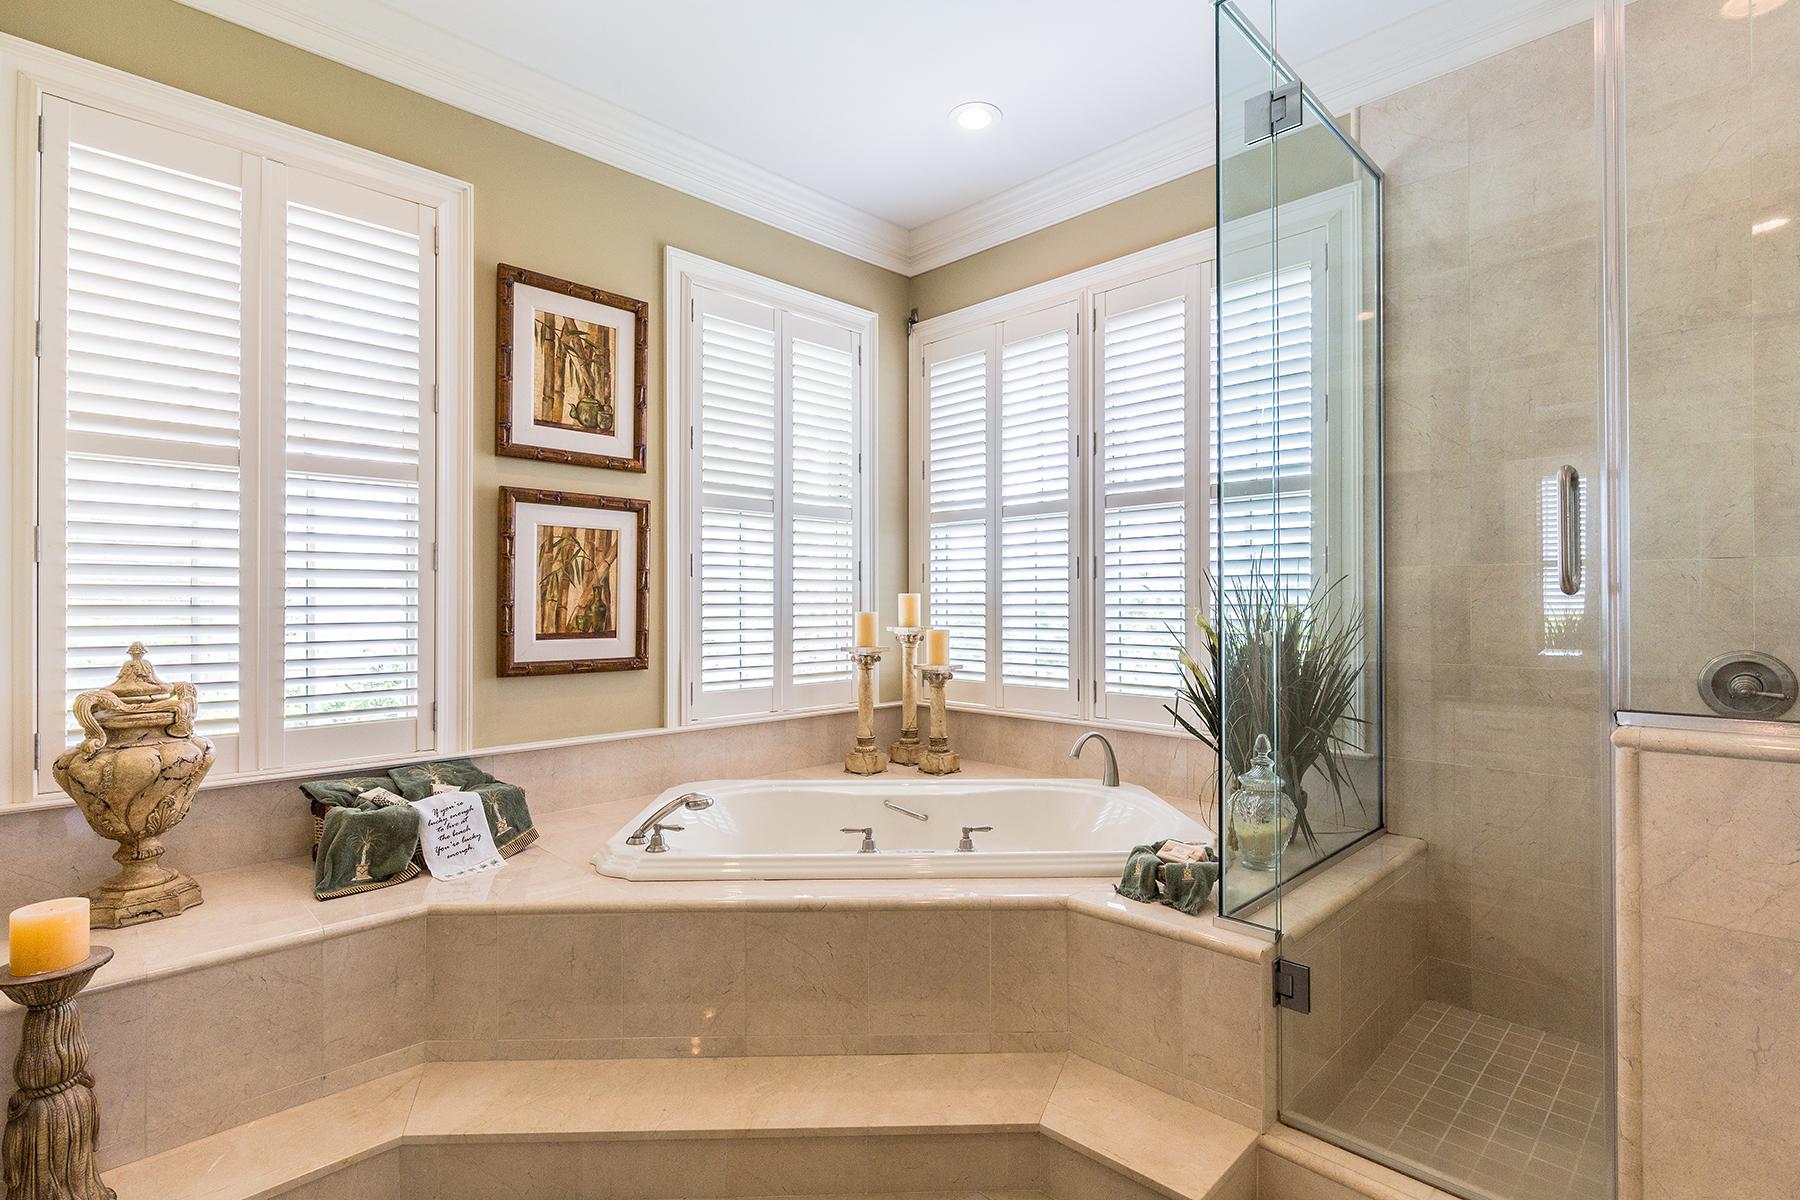 Additional photo for property listing at 417 Beach Bridge Rd  Pawleys Island, South Carolina 29585 United States